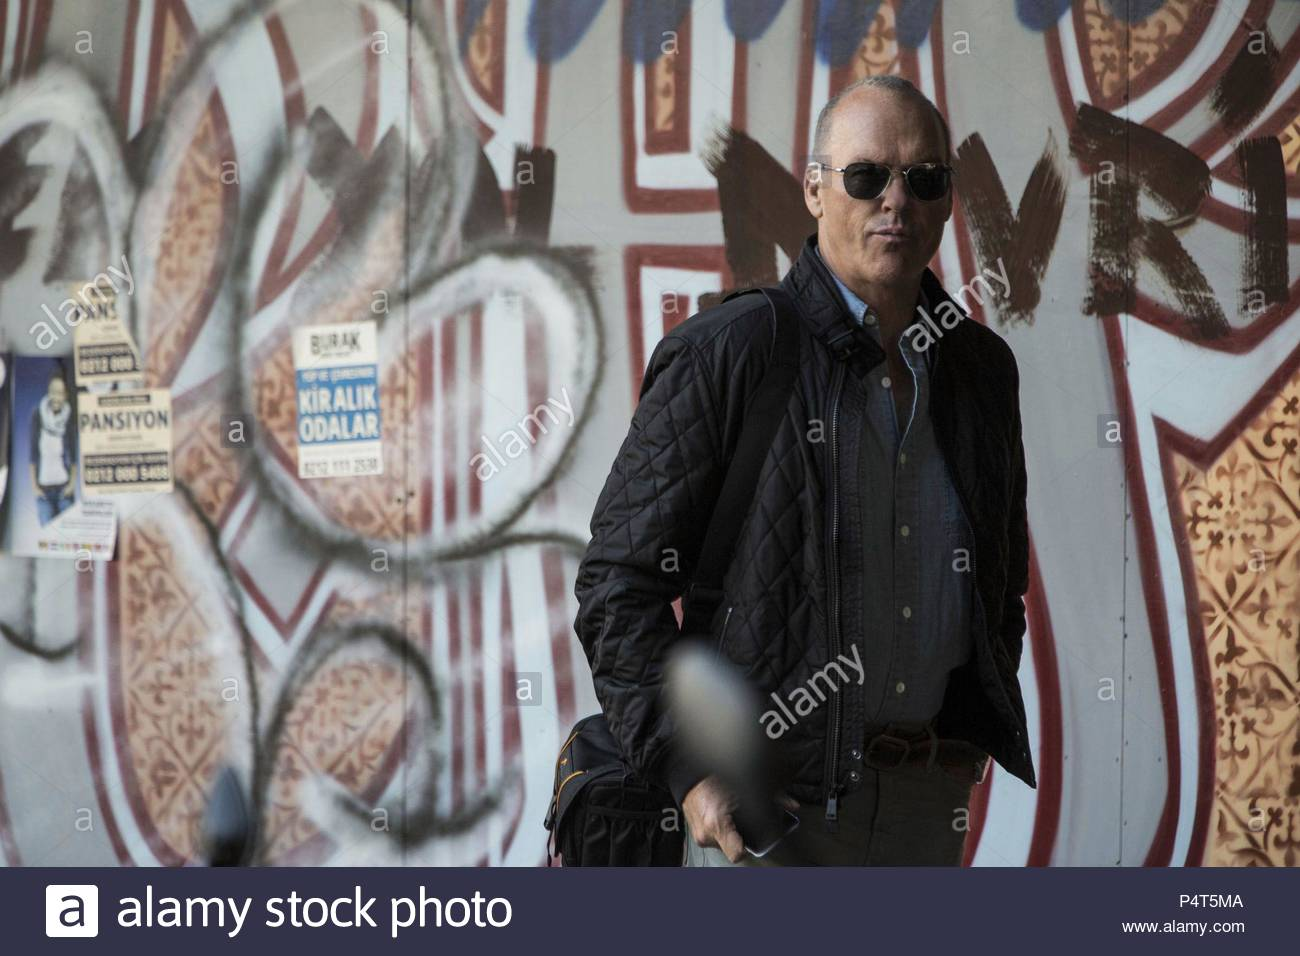 9b50611210 Original Film Title  AMERICAN ASSASSIN. English Title  AMERICAN ASSASSIN.  Film Director  MICHAEL CUESTA. Year  2017. Stars  MICHAEL KEATON.